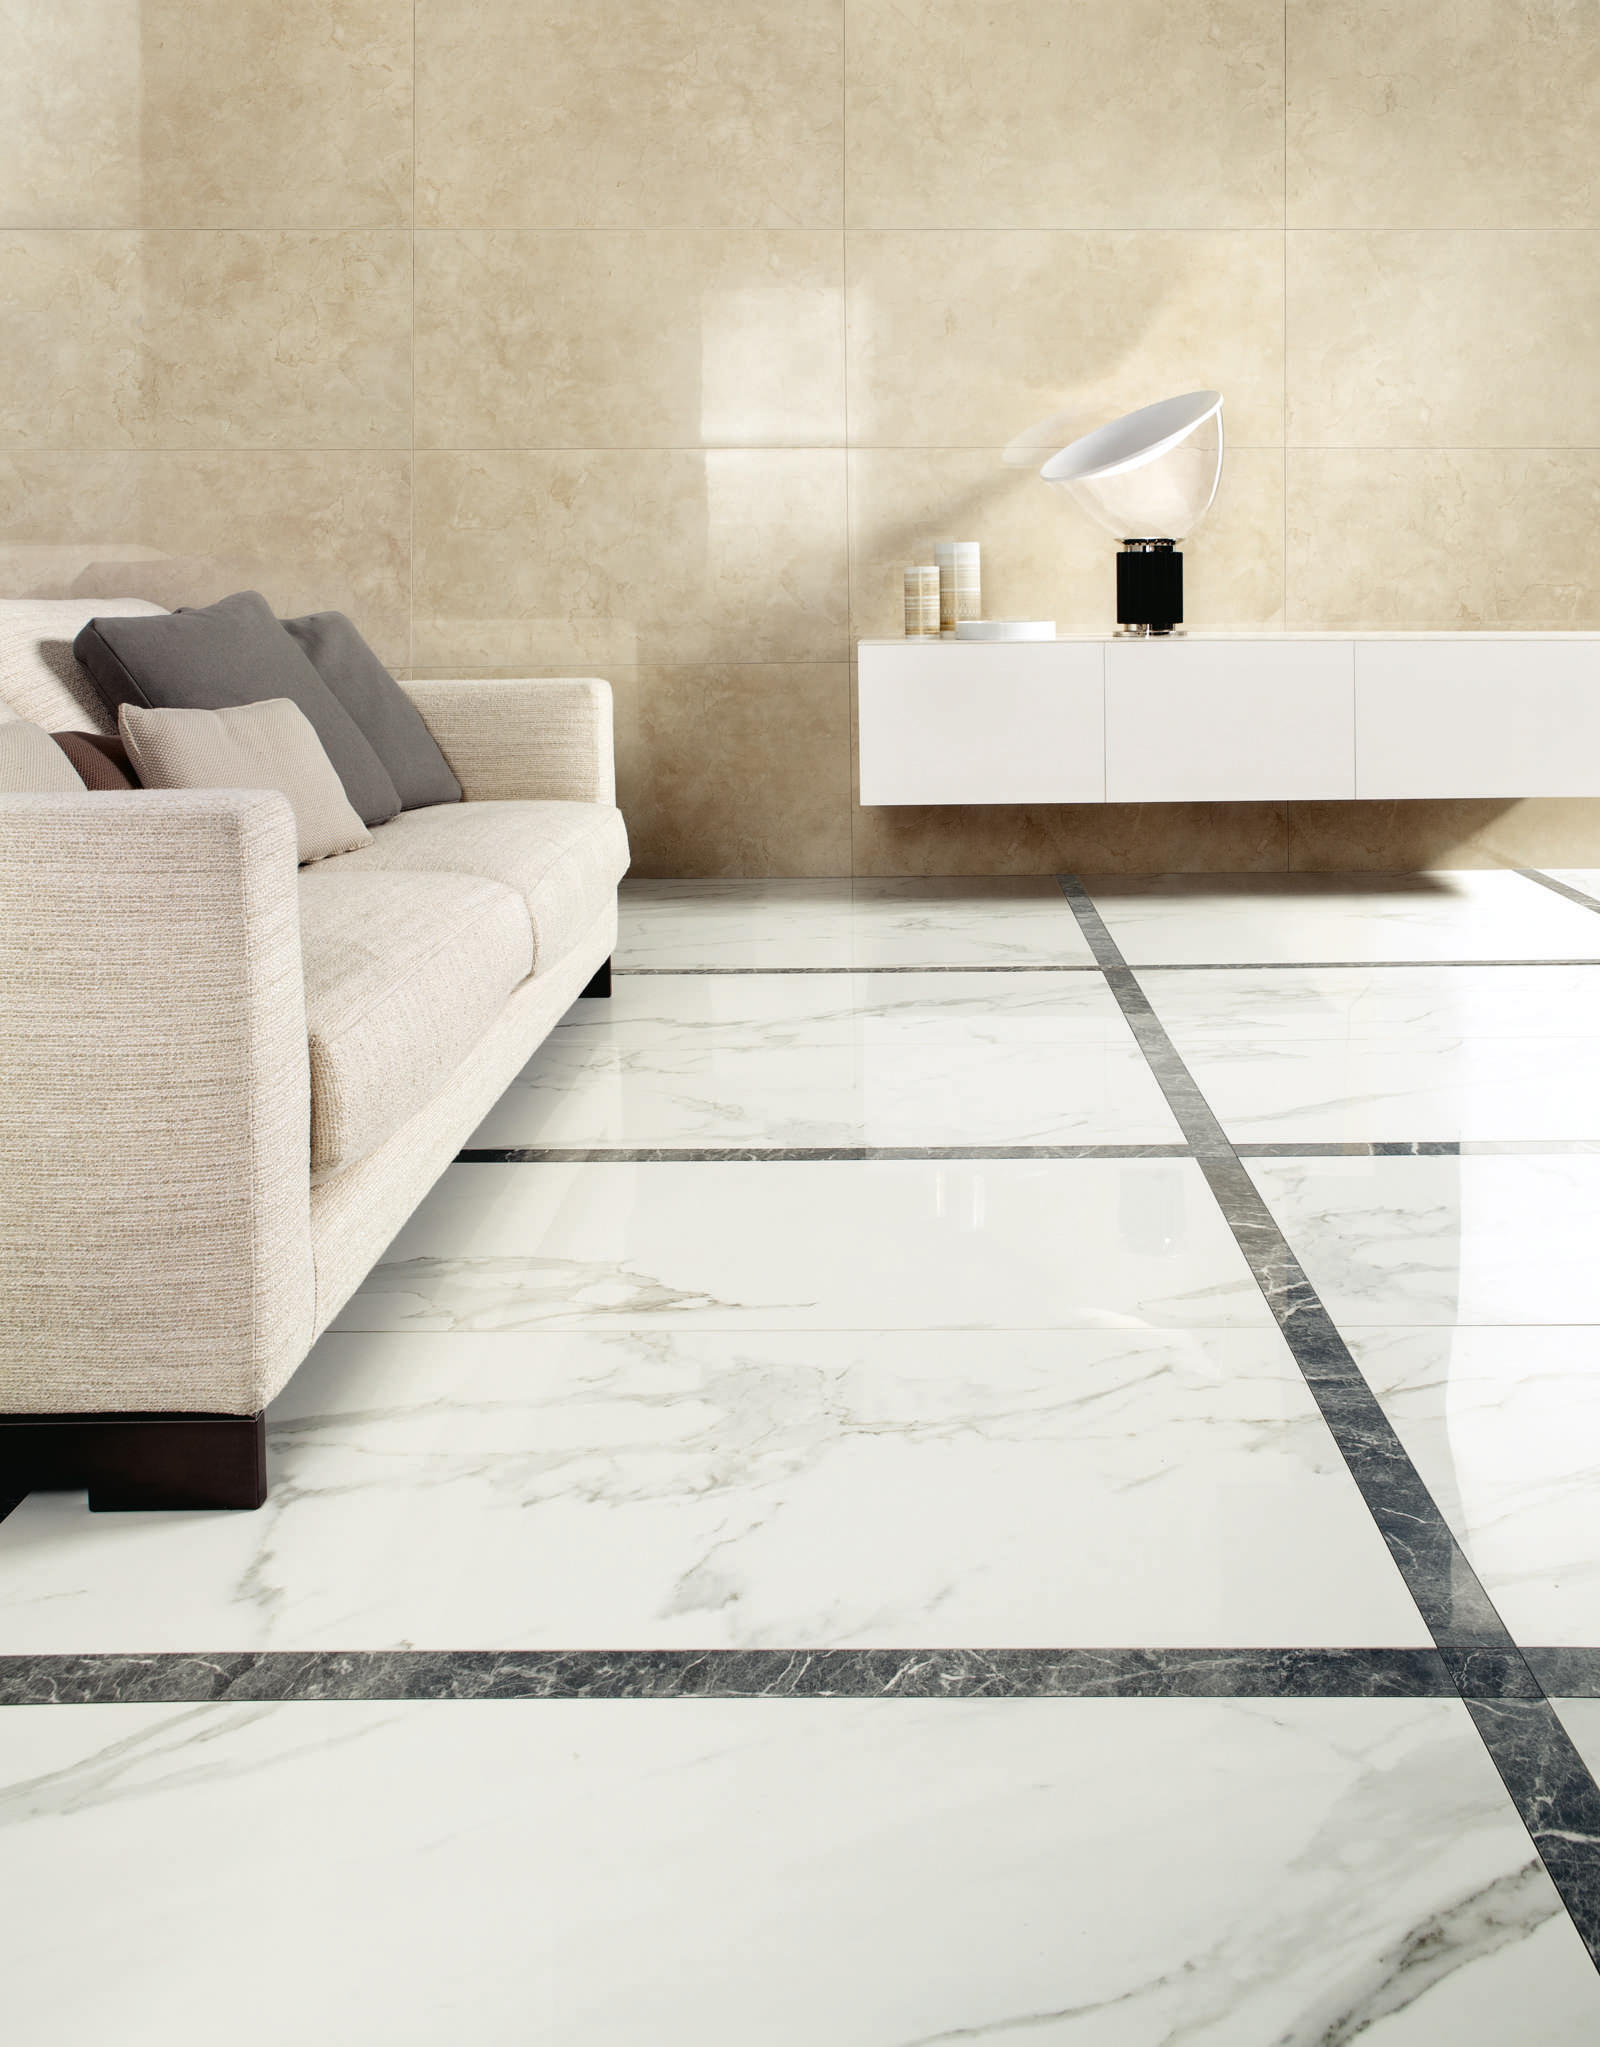 Anima decors composizione f calacatta oro floor tiles for Carrelage marbre